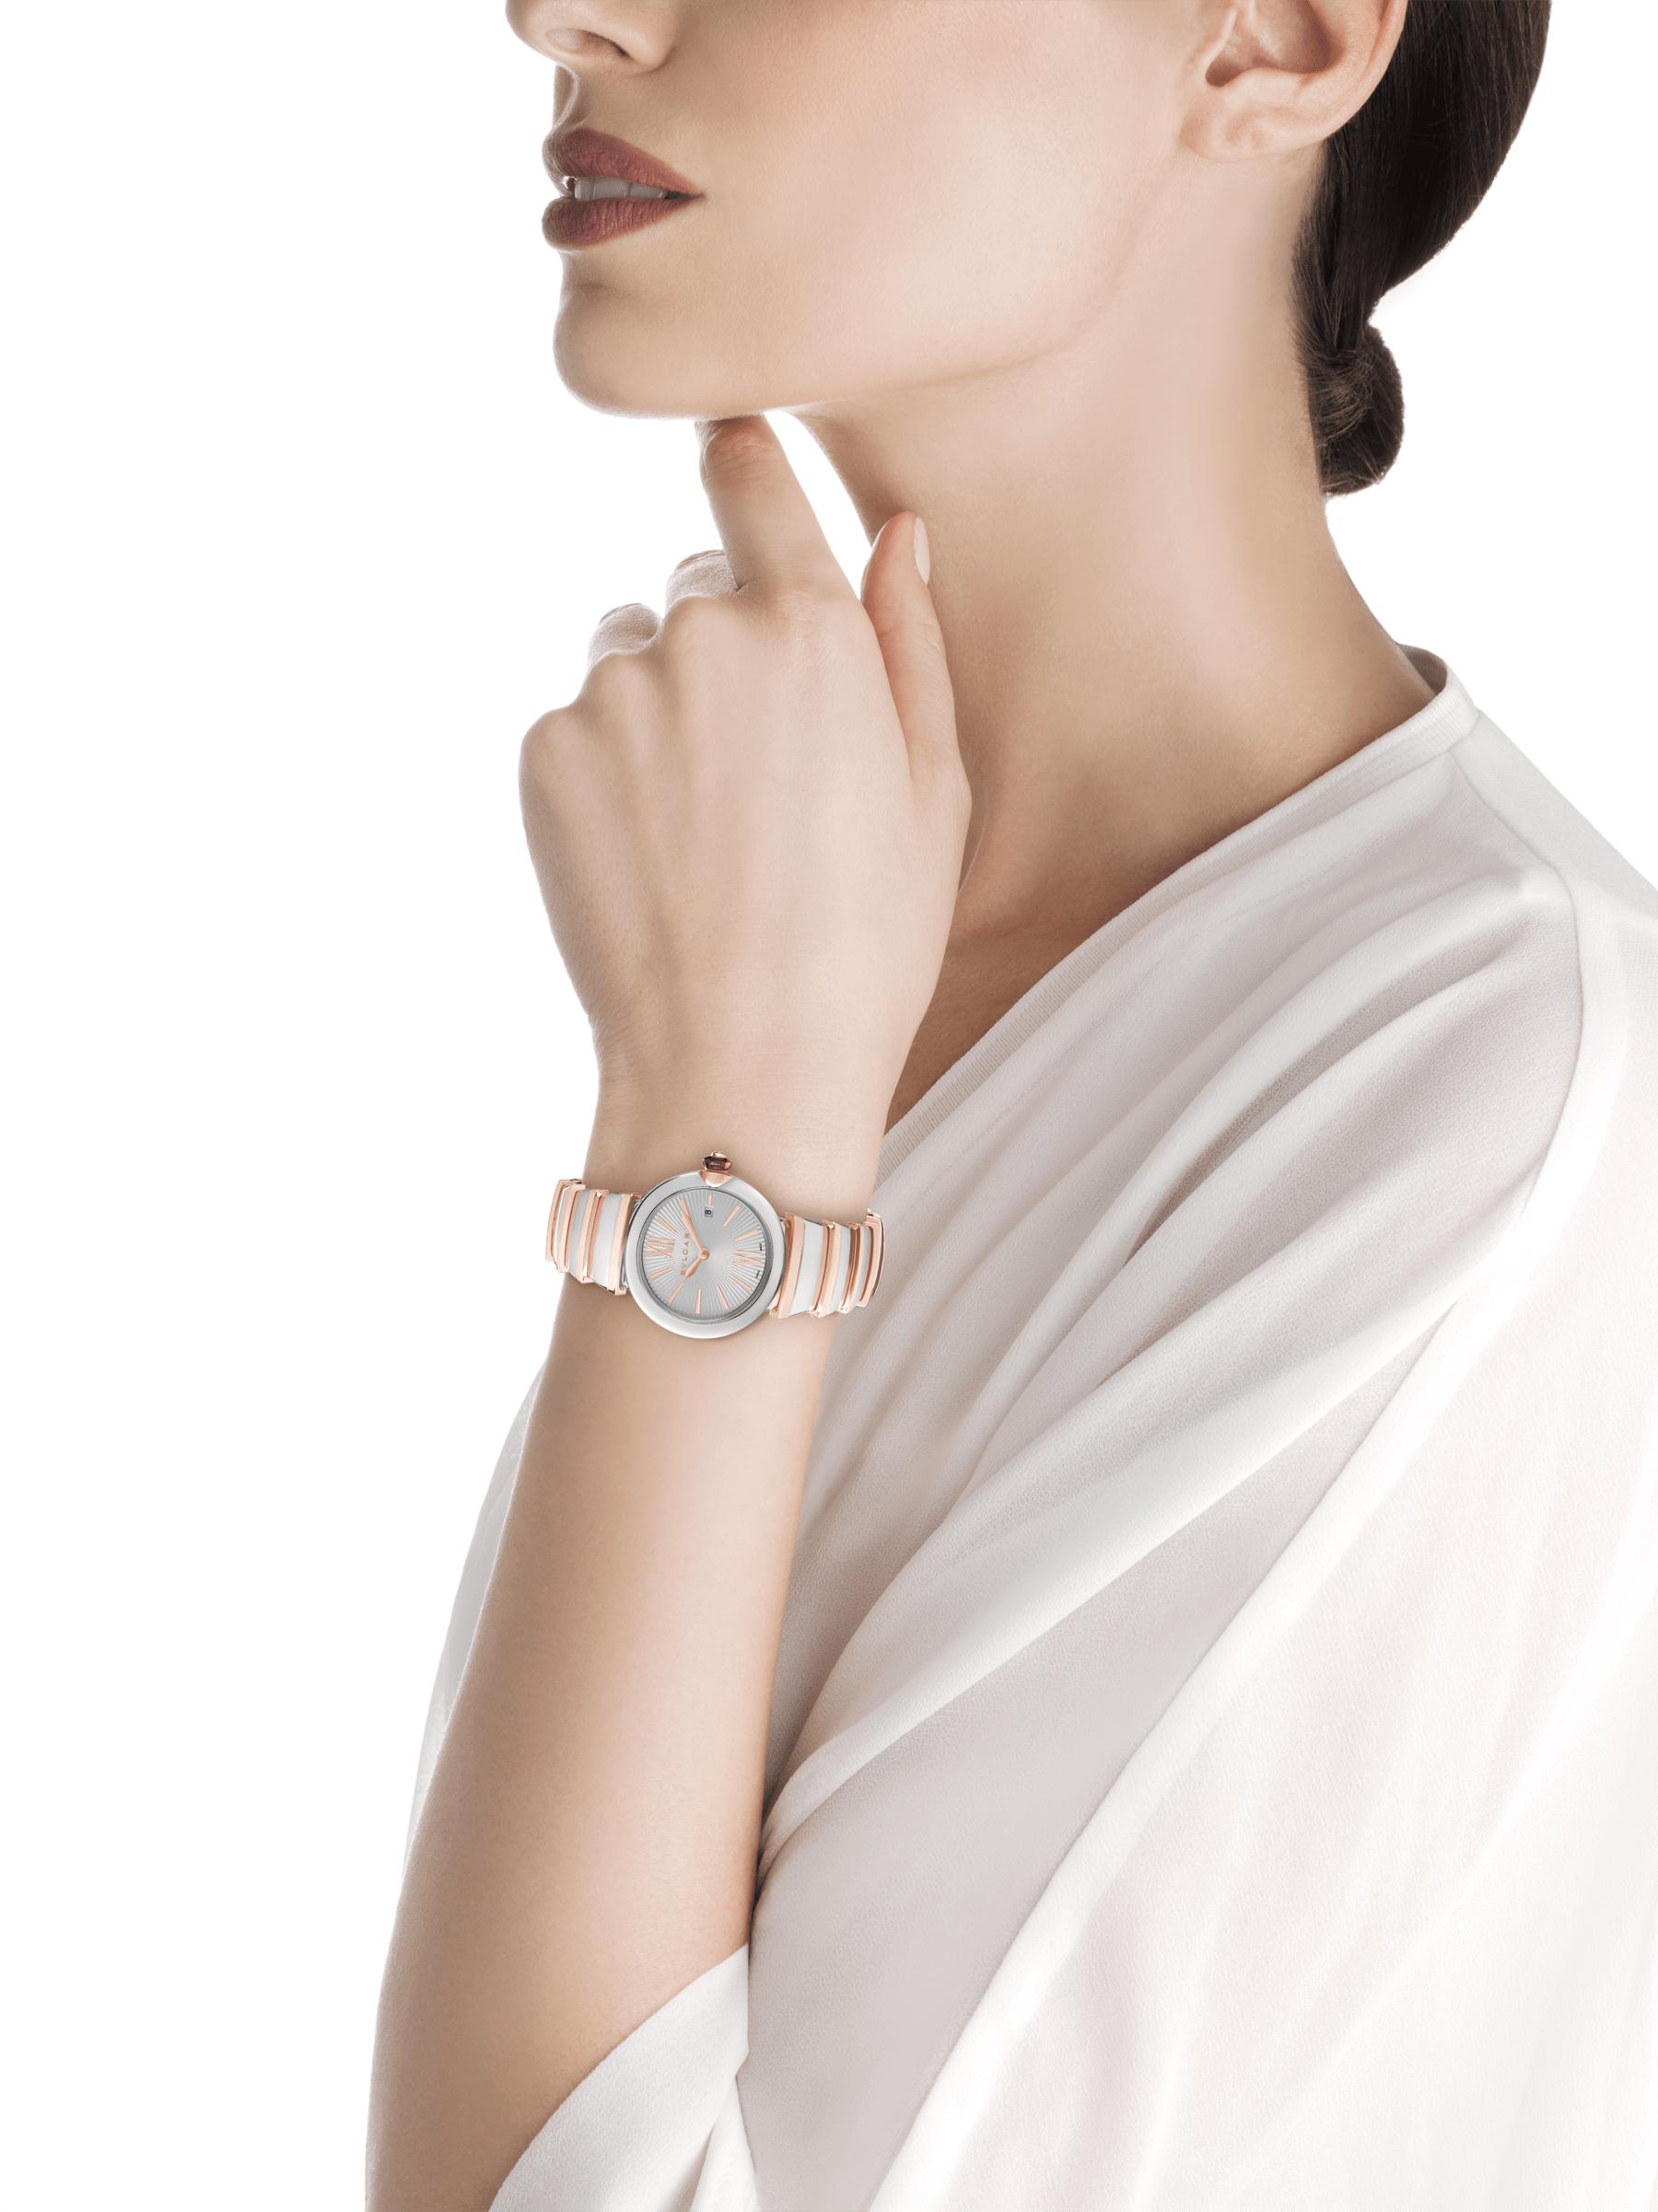 Montre LVCEA avec boîtier en acier inoxydable, cadran en opaline argentée et bracelet en or rose 18K et acier inoxydable. 102193 image 4